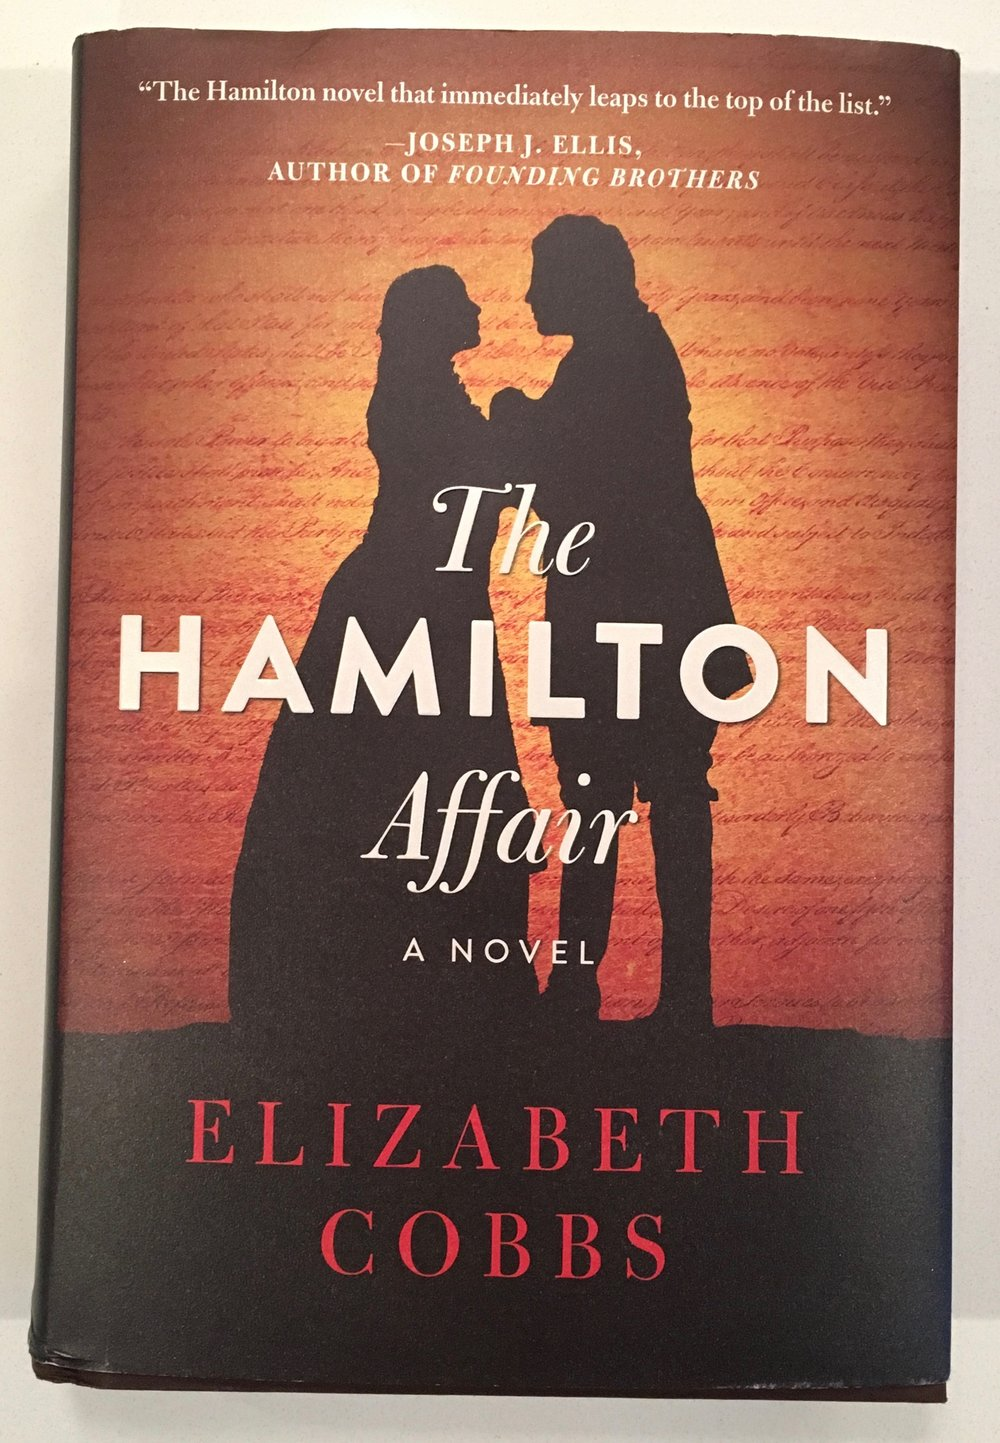 hamilton-affair-elizabethcobbs